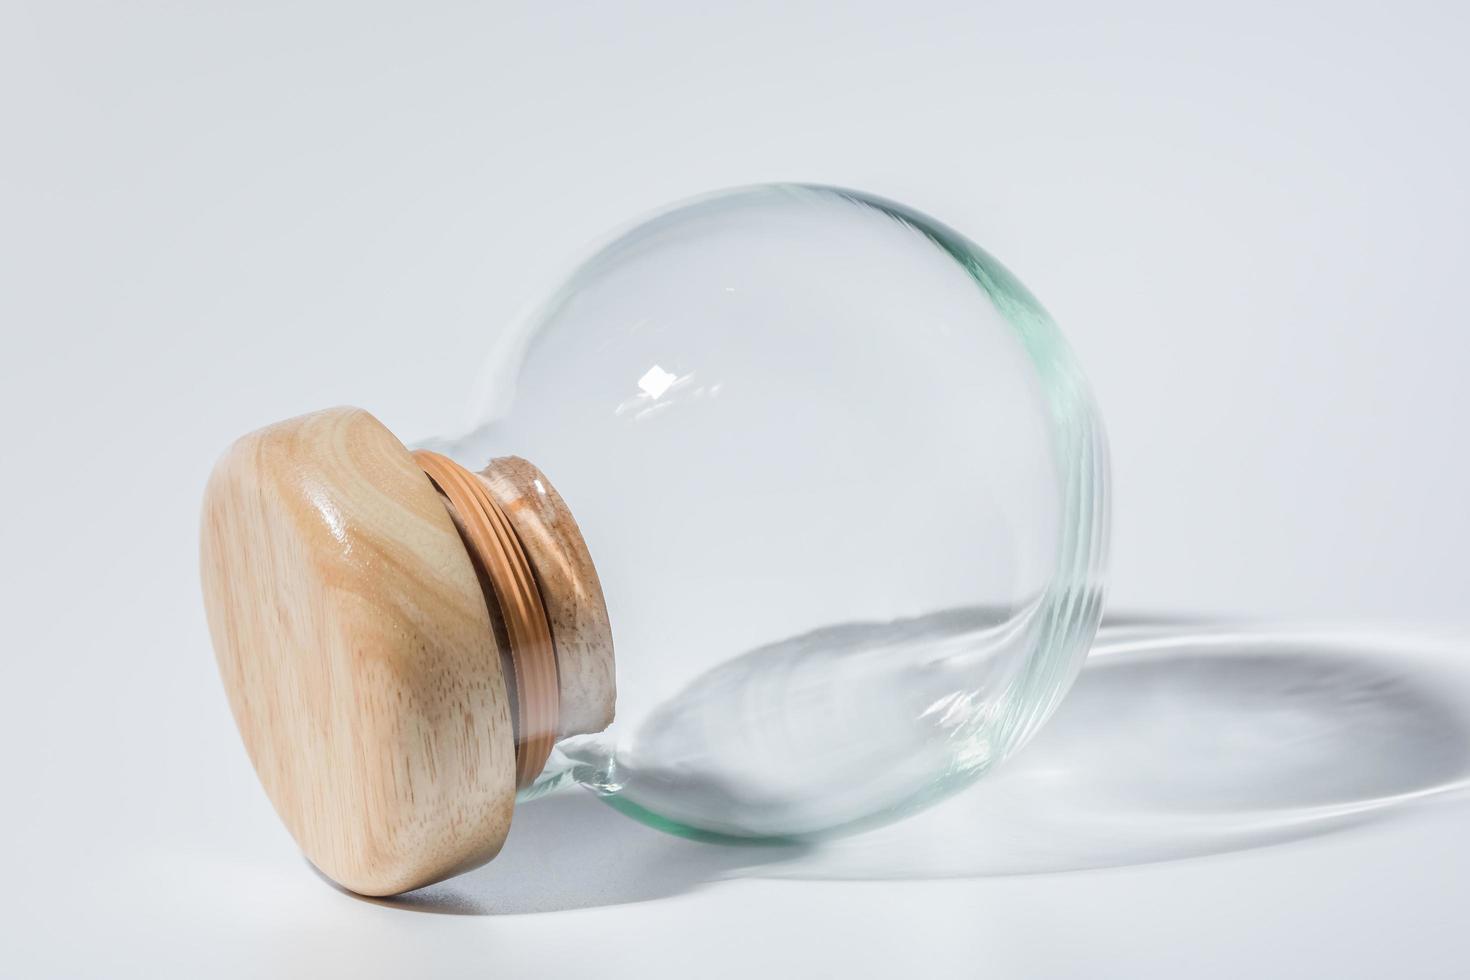 Sphere shaped glass jar photo